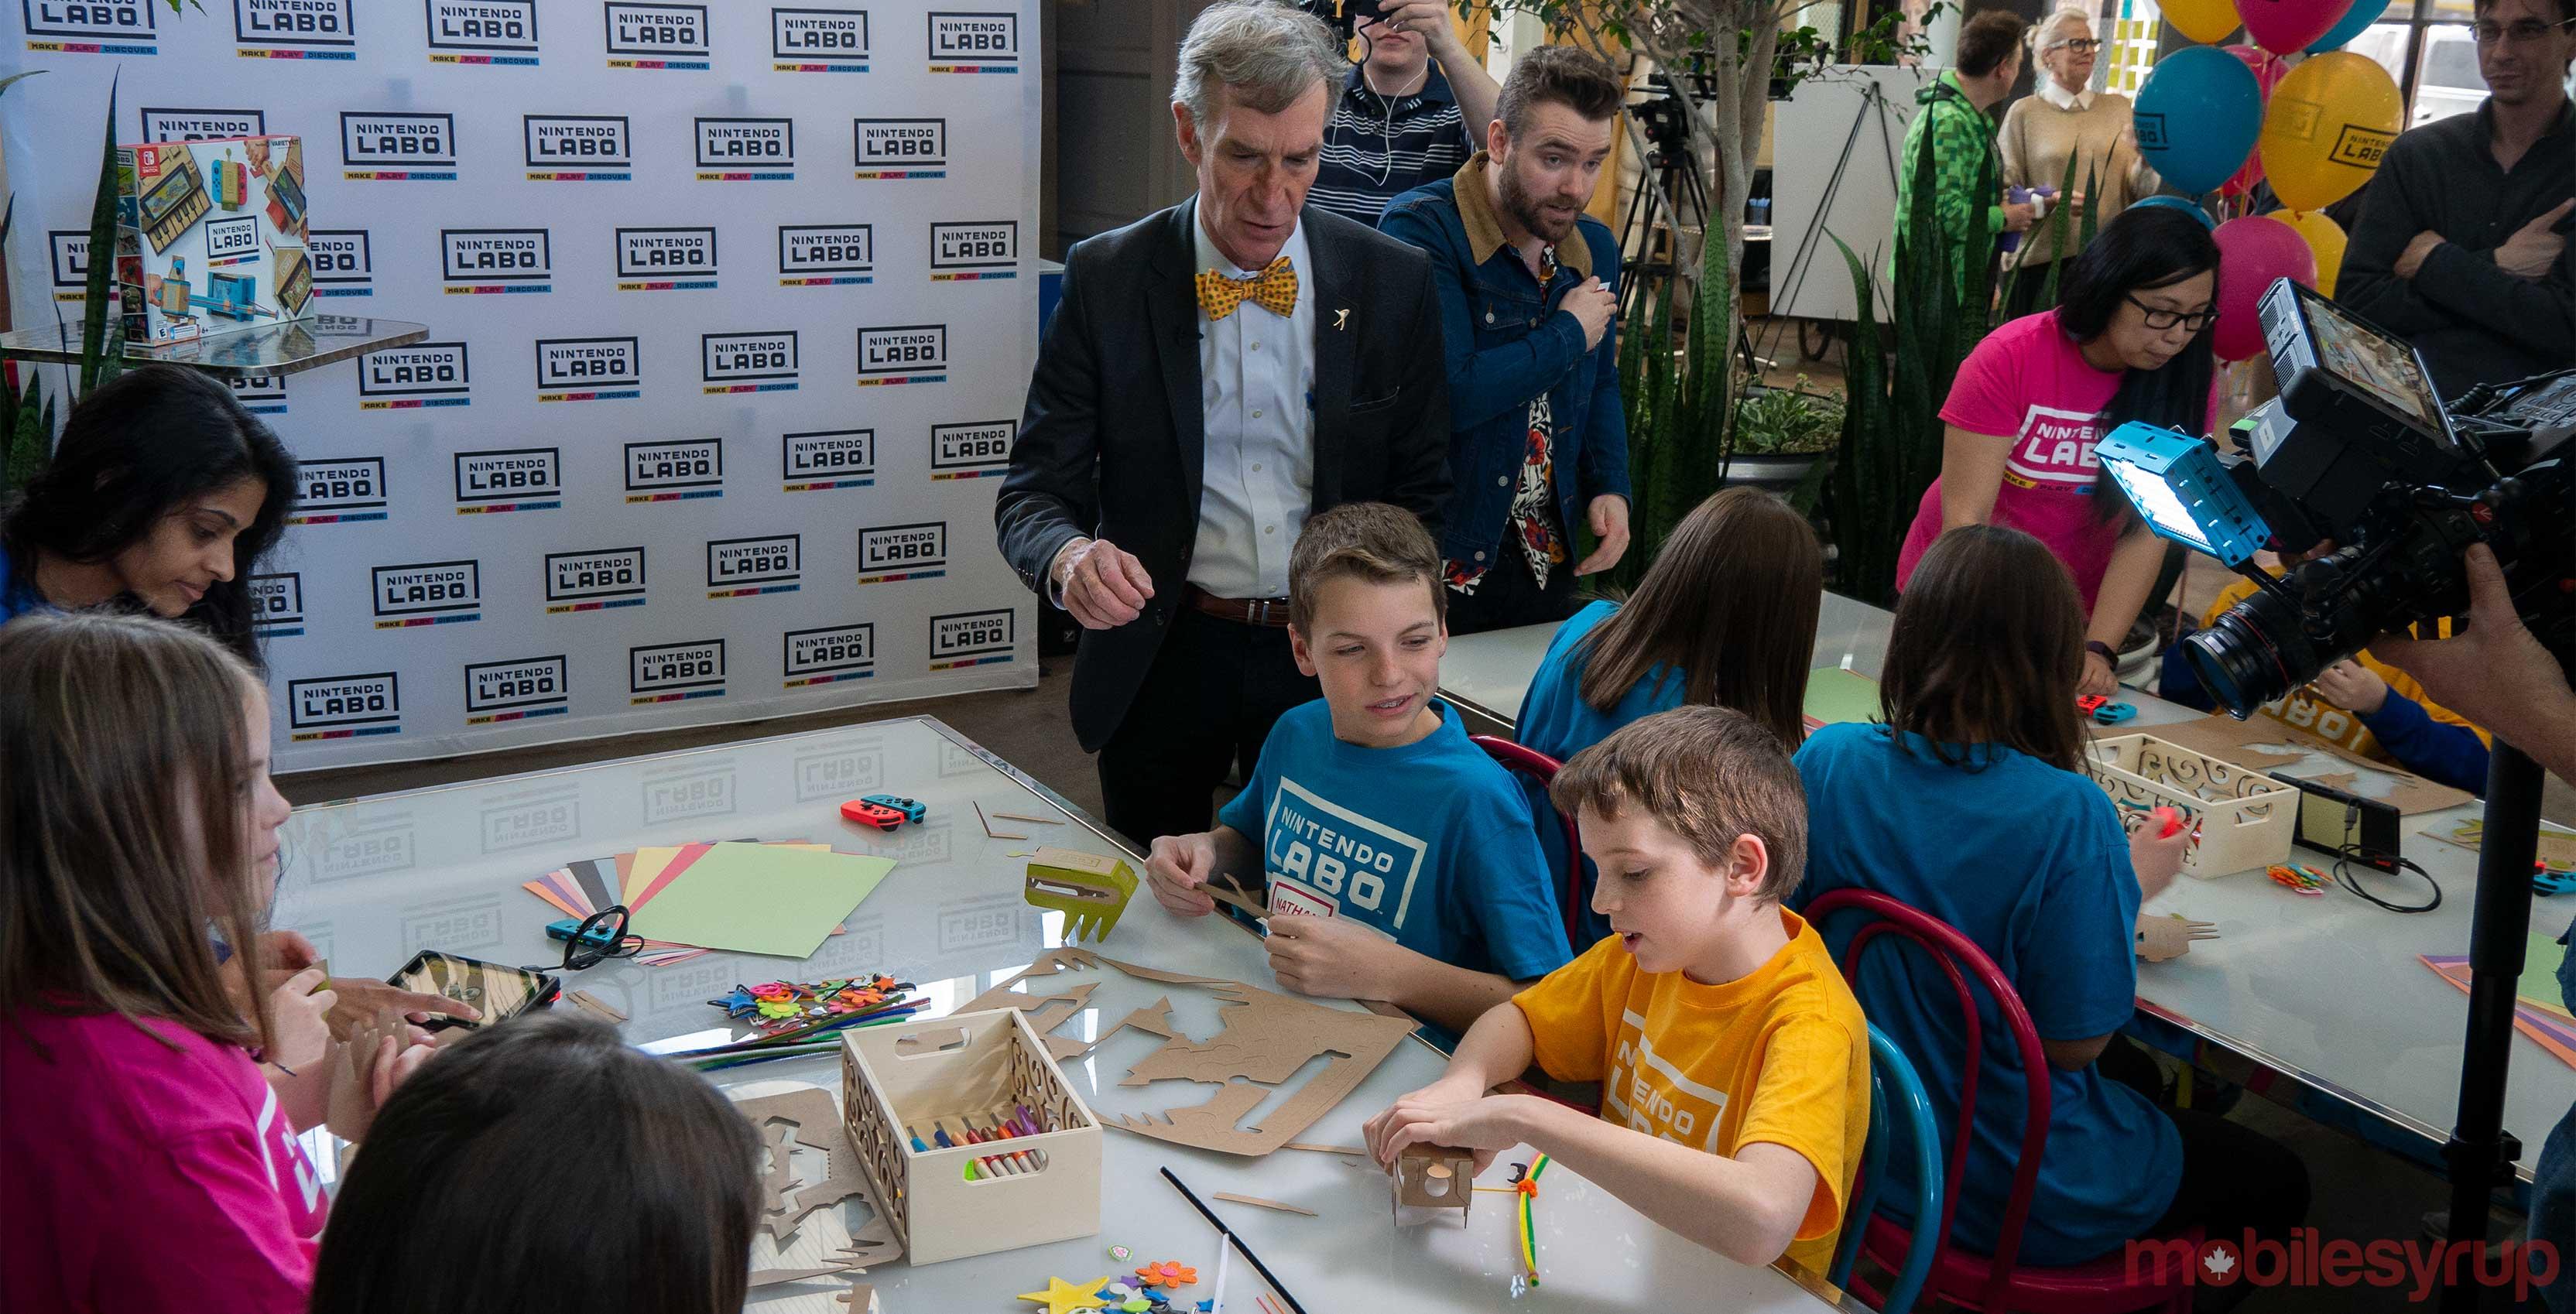 Nintendo Labo Bill Nye with kids